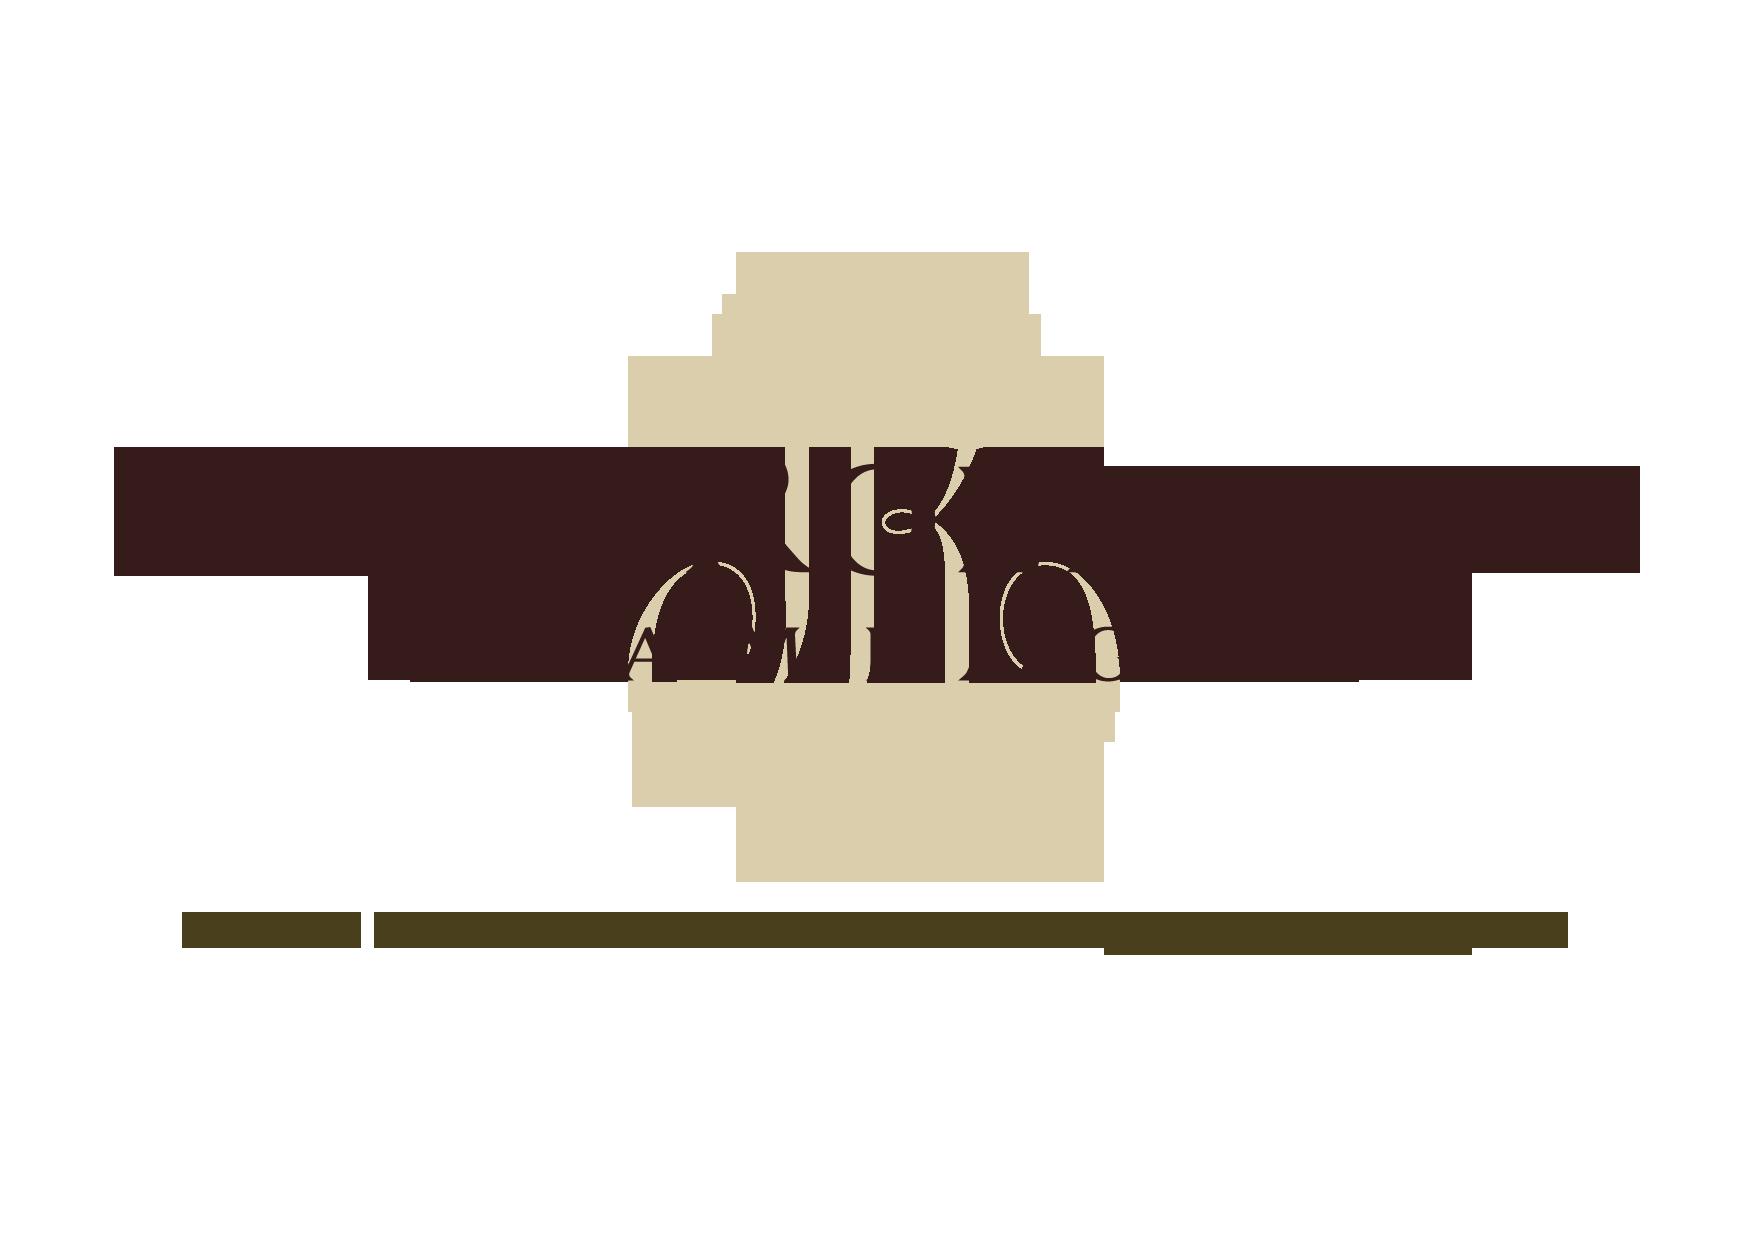 ROEDERER_logotype - fond BLANC 2 copy.png